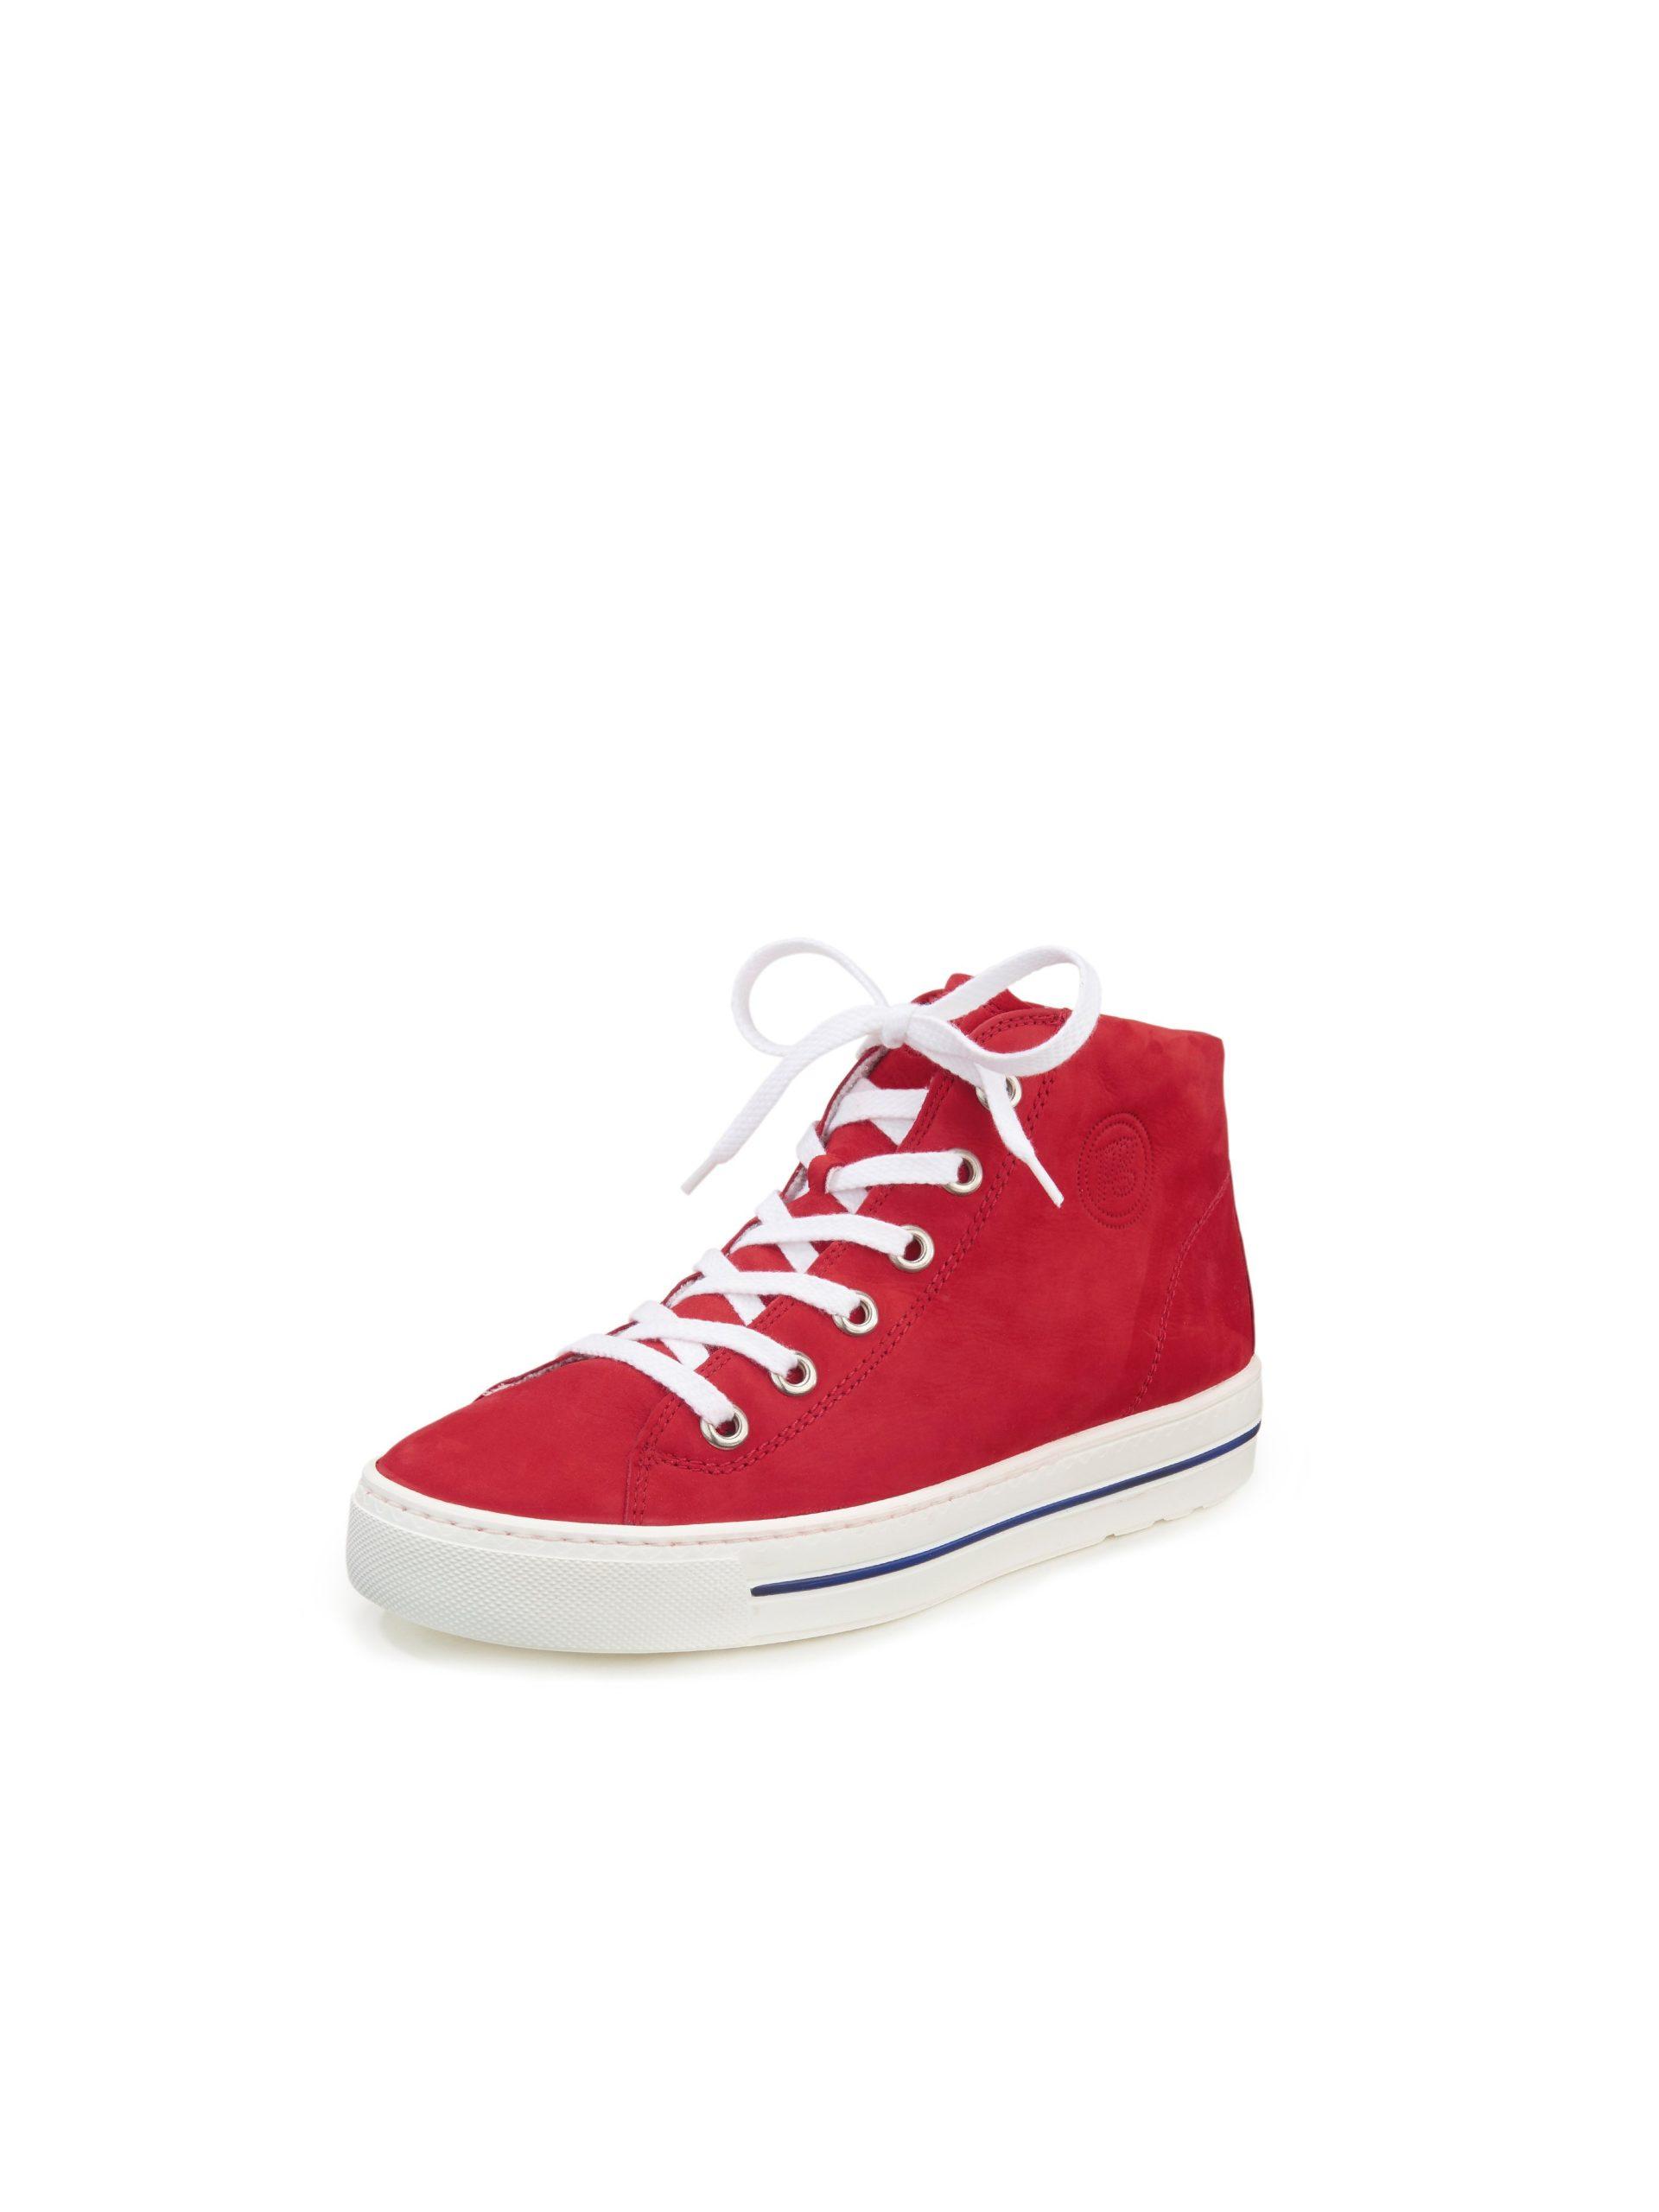 Enkelhoge sneakers van kalfsnubuckleer Van Paul Green rood Kopen